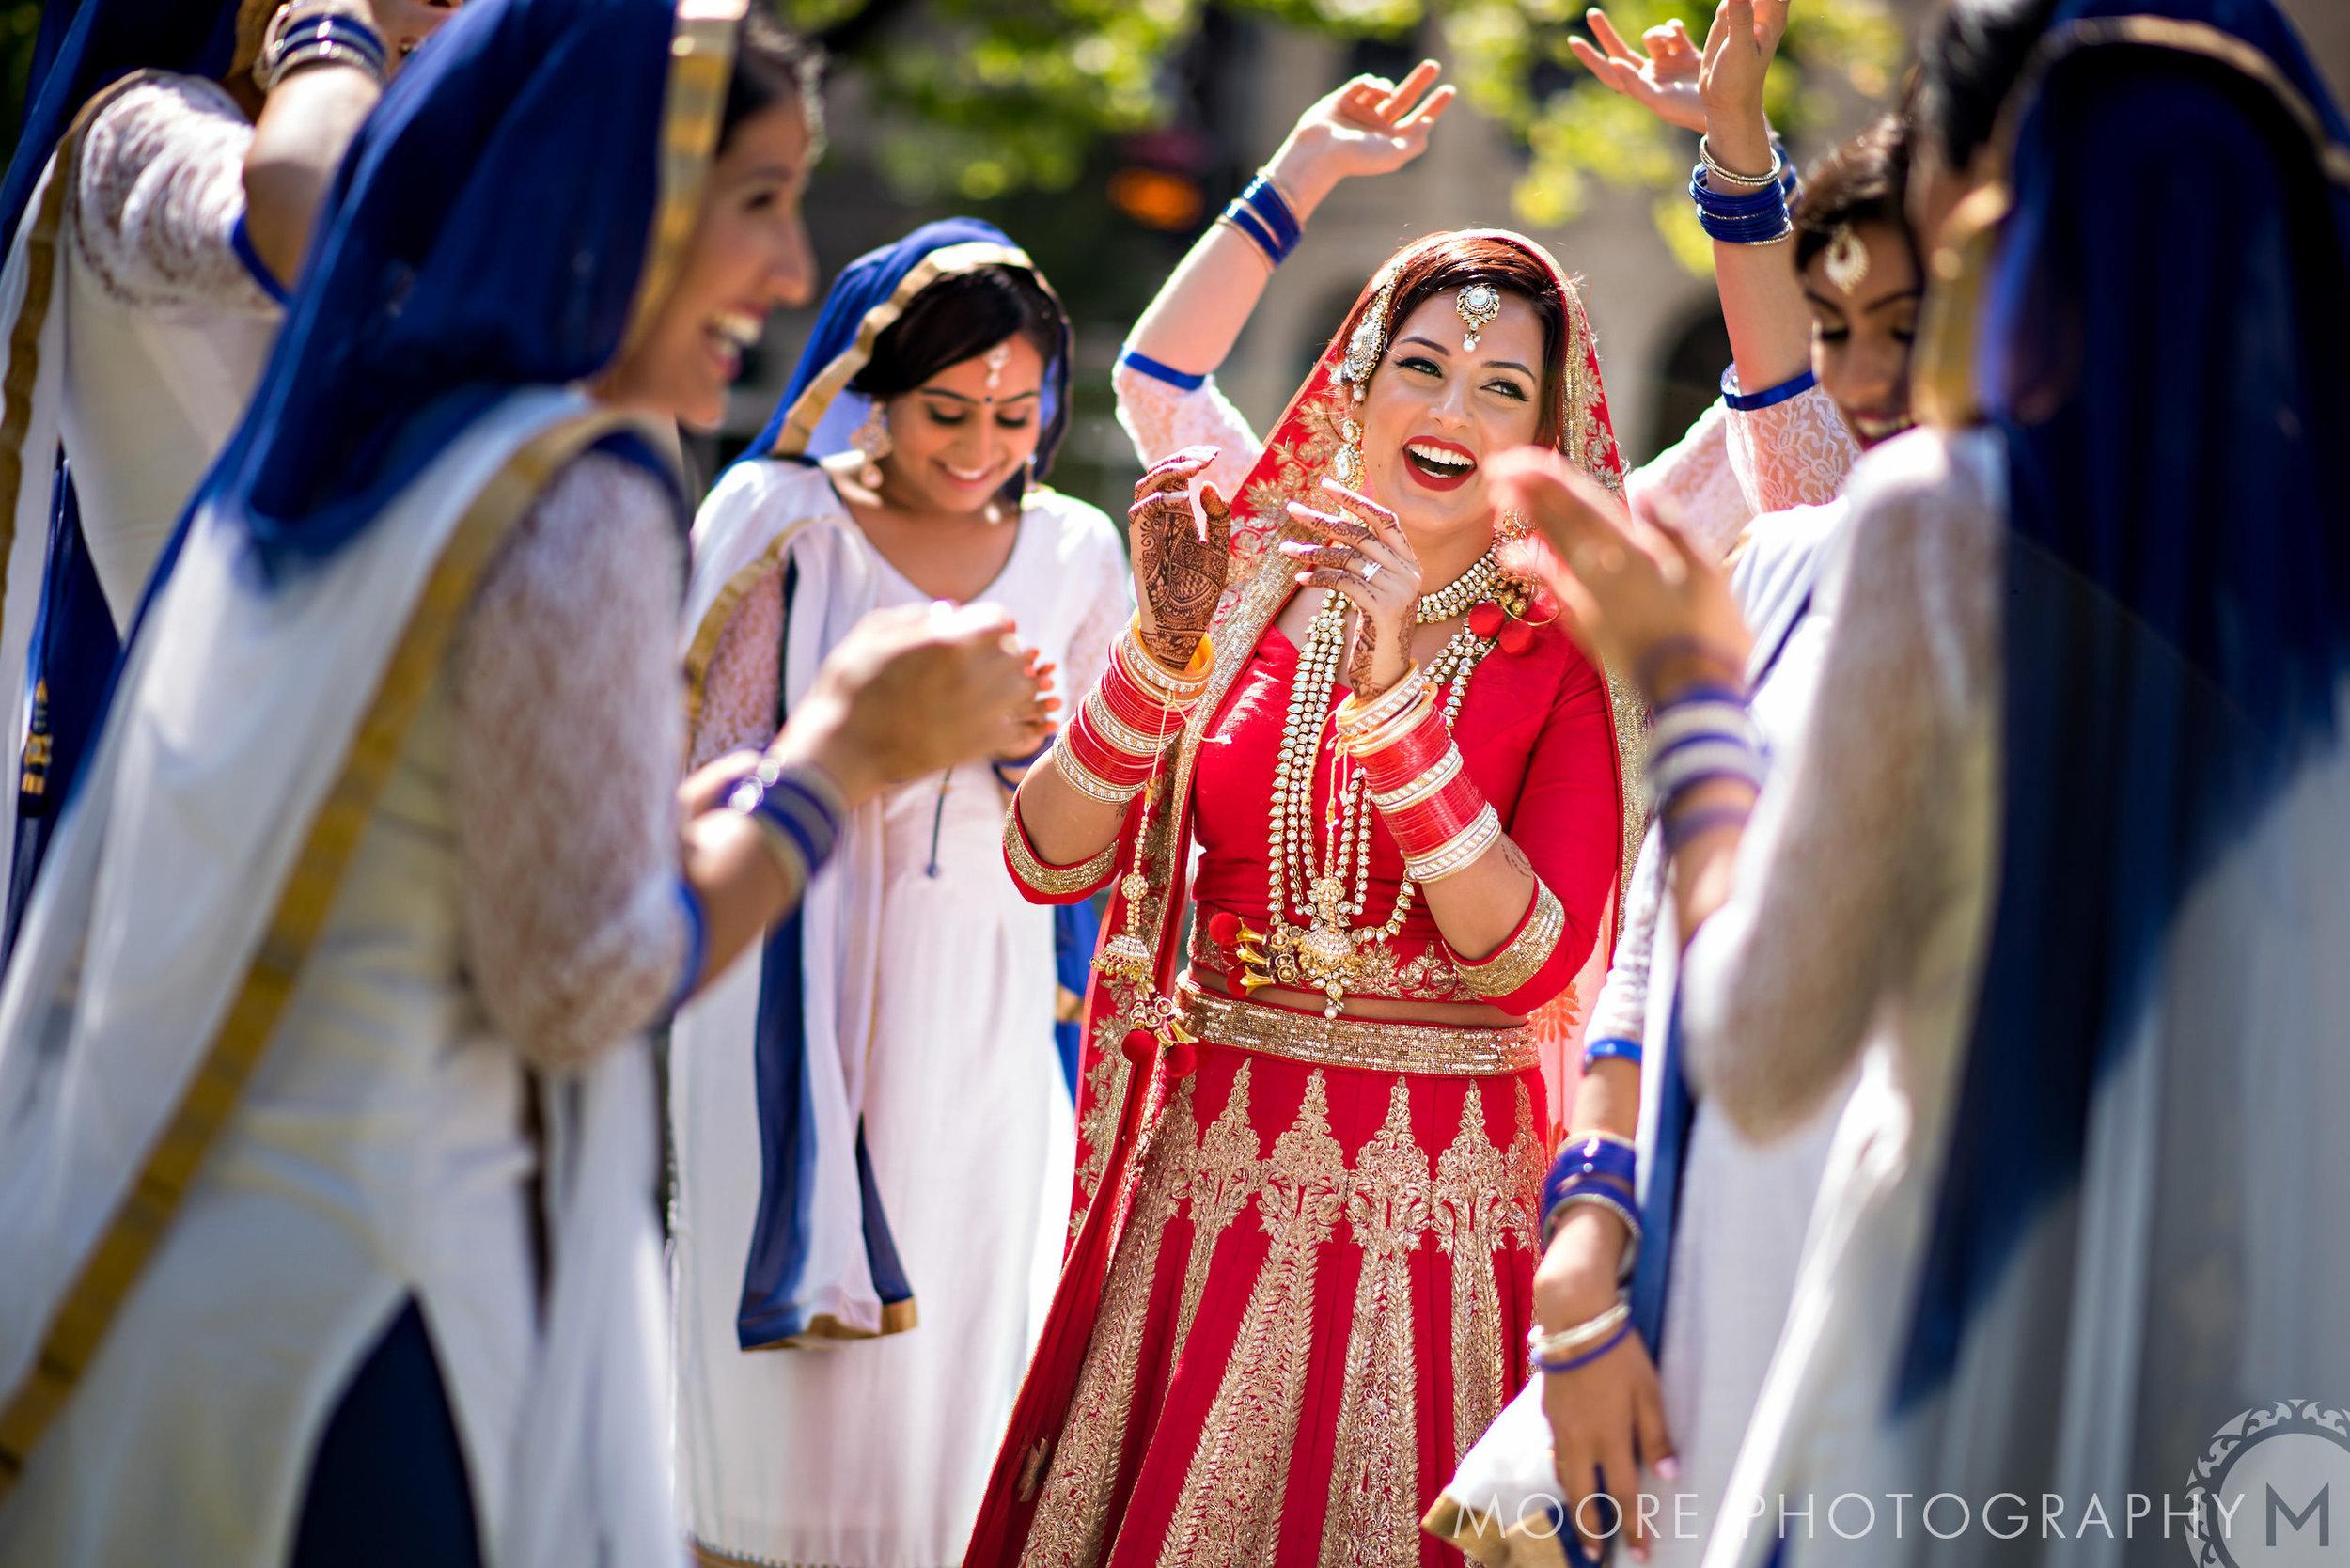 Toronto Makeup Artist, Toronto Wedding makeup artist, Markham Makeup Artist, Sikh Wedding Makeup Artist, indian wedding makeup artist toronto, sikh wedding makeup artist toronto, toronto punjabi wedding - solo.jpg